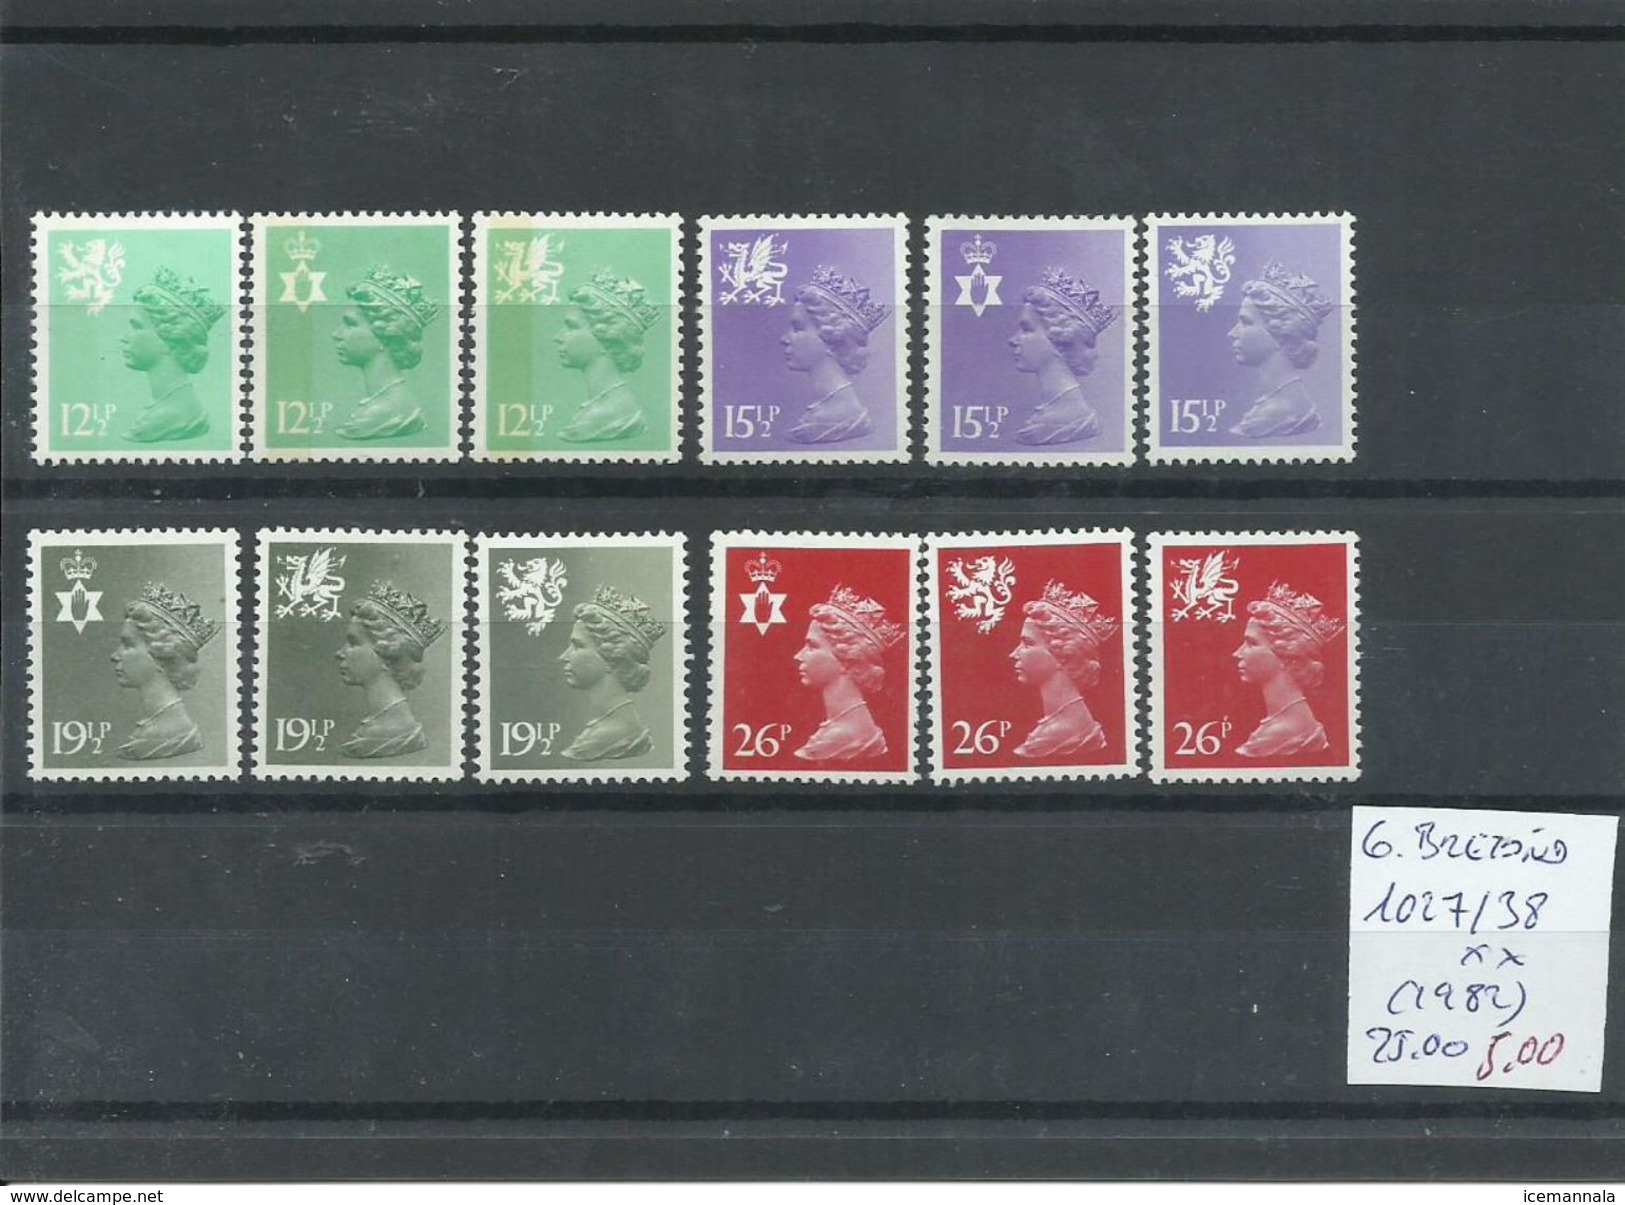 GRAN BRETAÑA YVERT  1027/38  MNH  ** - 1952-.... (Elizabeth II)